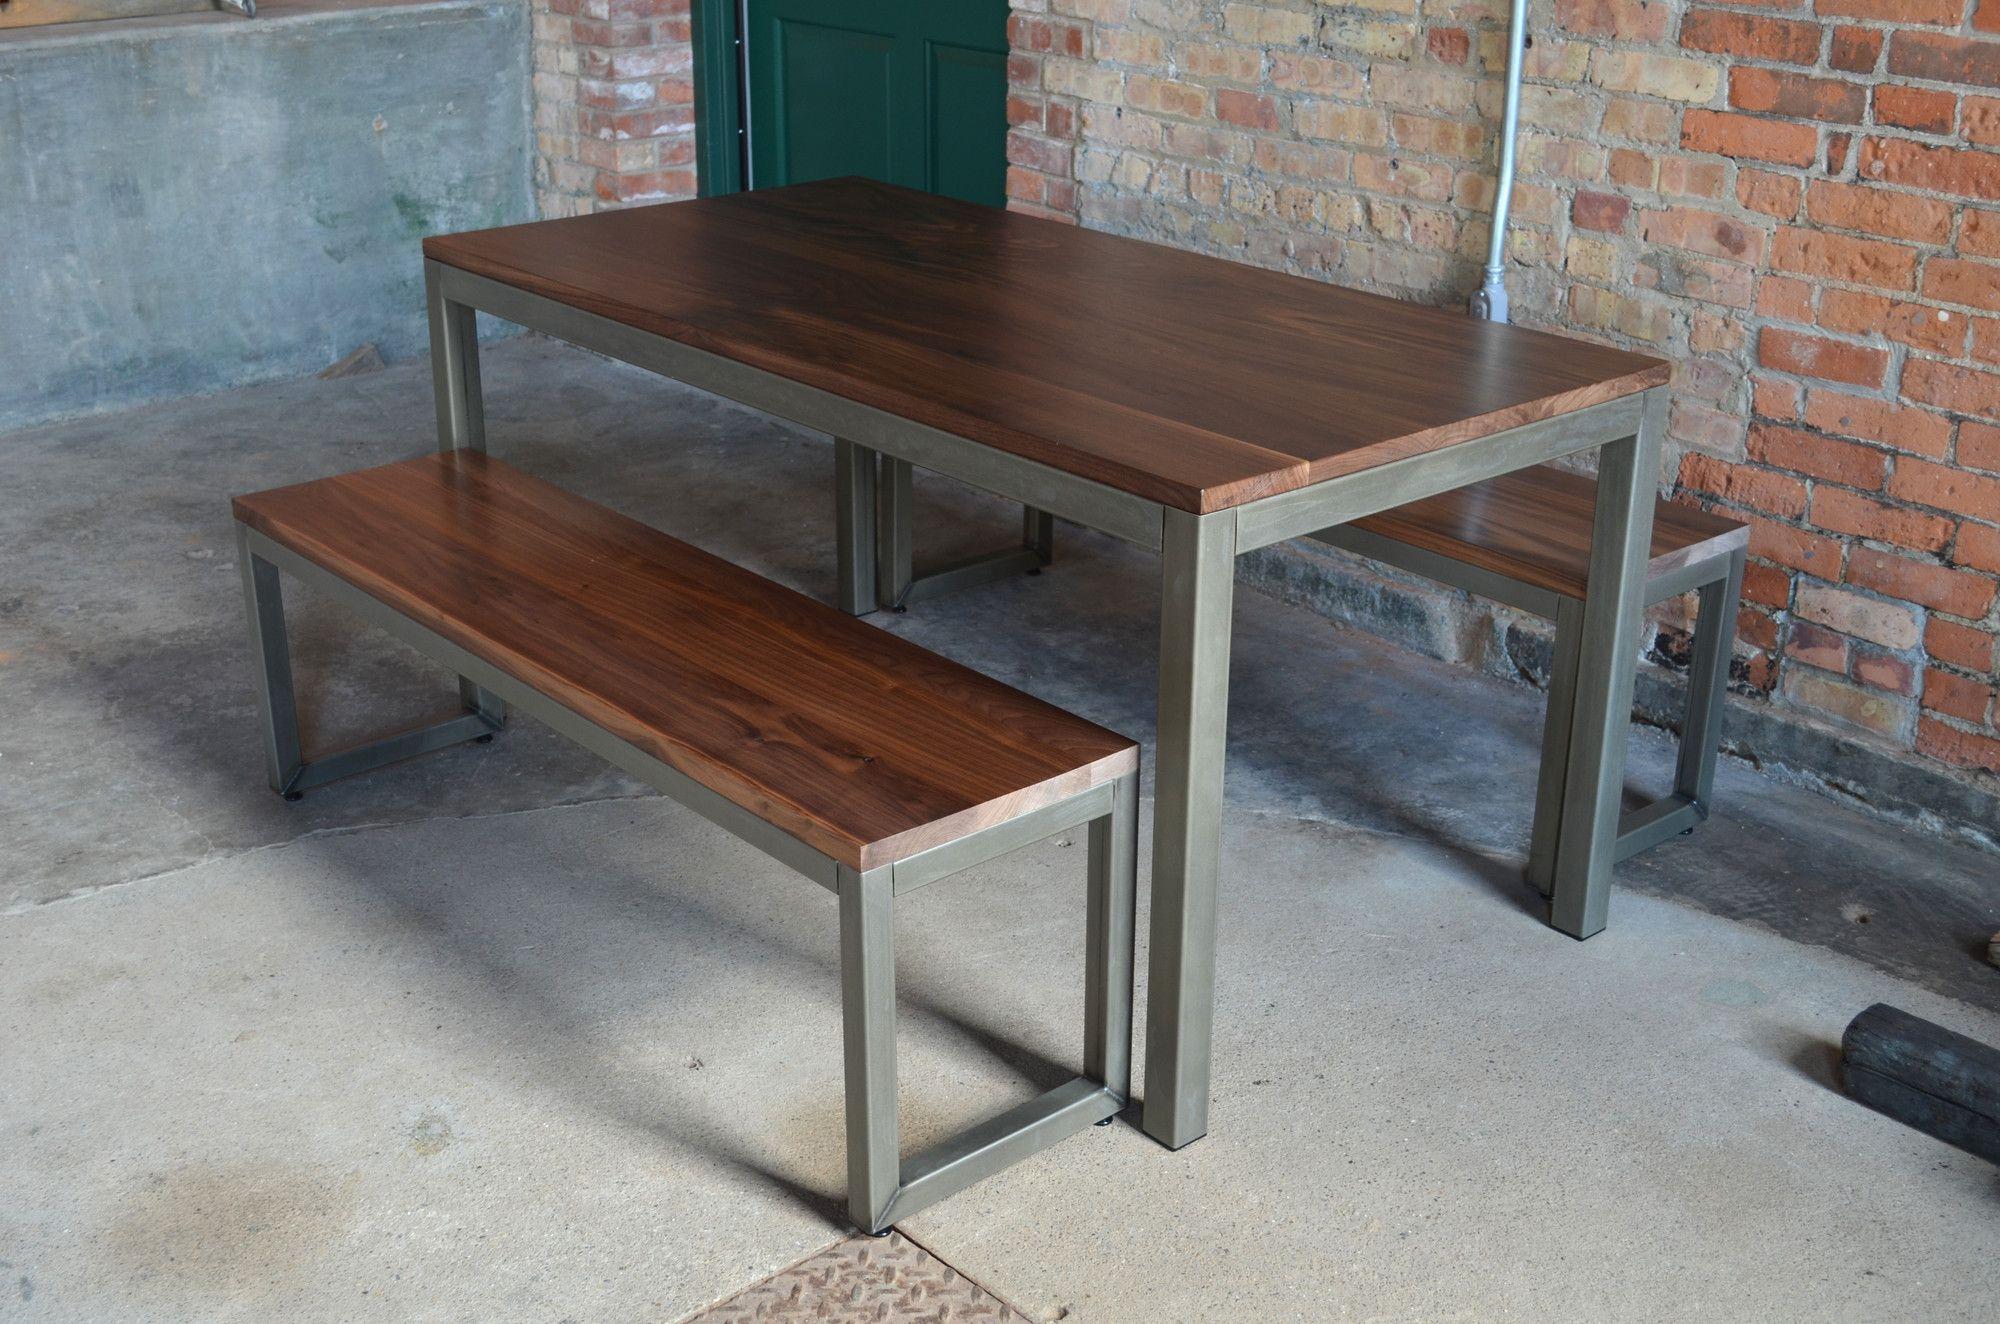 Wondrous Loft 3 Piece Dining Set Kitchen Table Ideas Furniture Bralicious Painted Fabric Chair Ideas Braliciousco